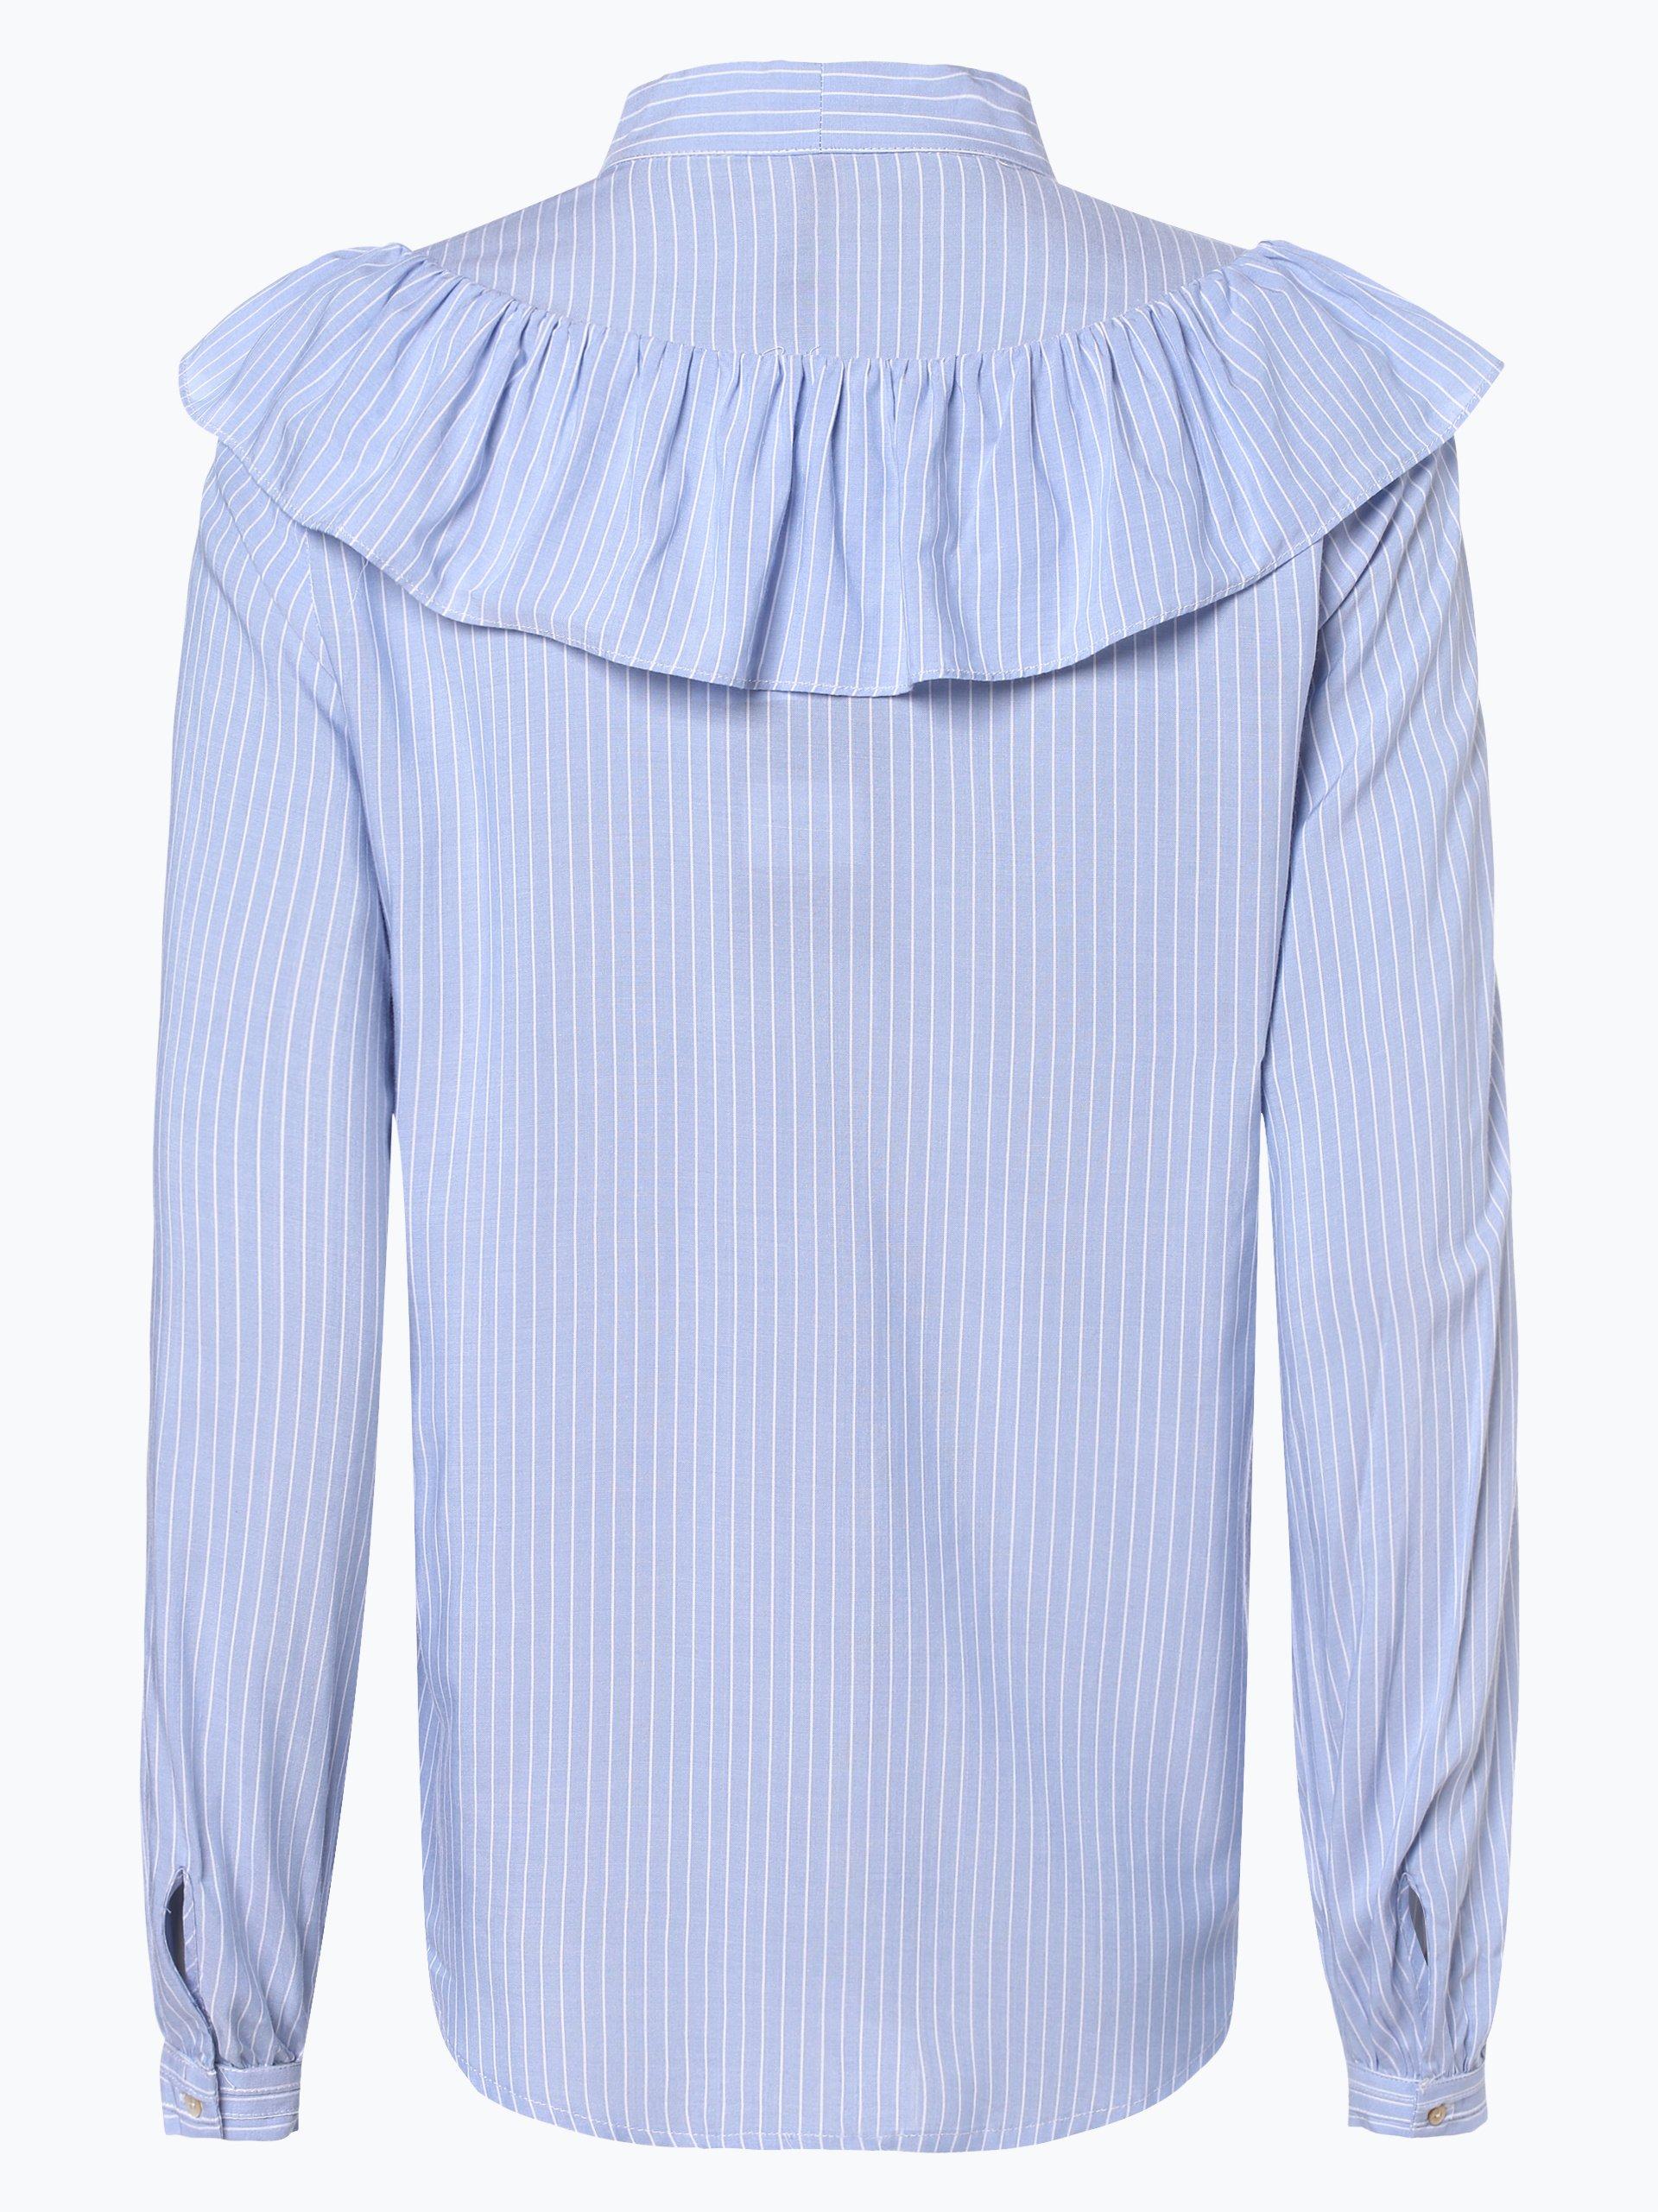 Pepe Jeans Damen Bluse - Ayumi